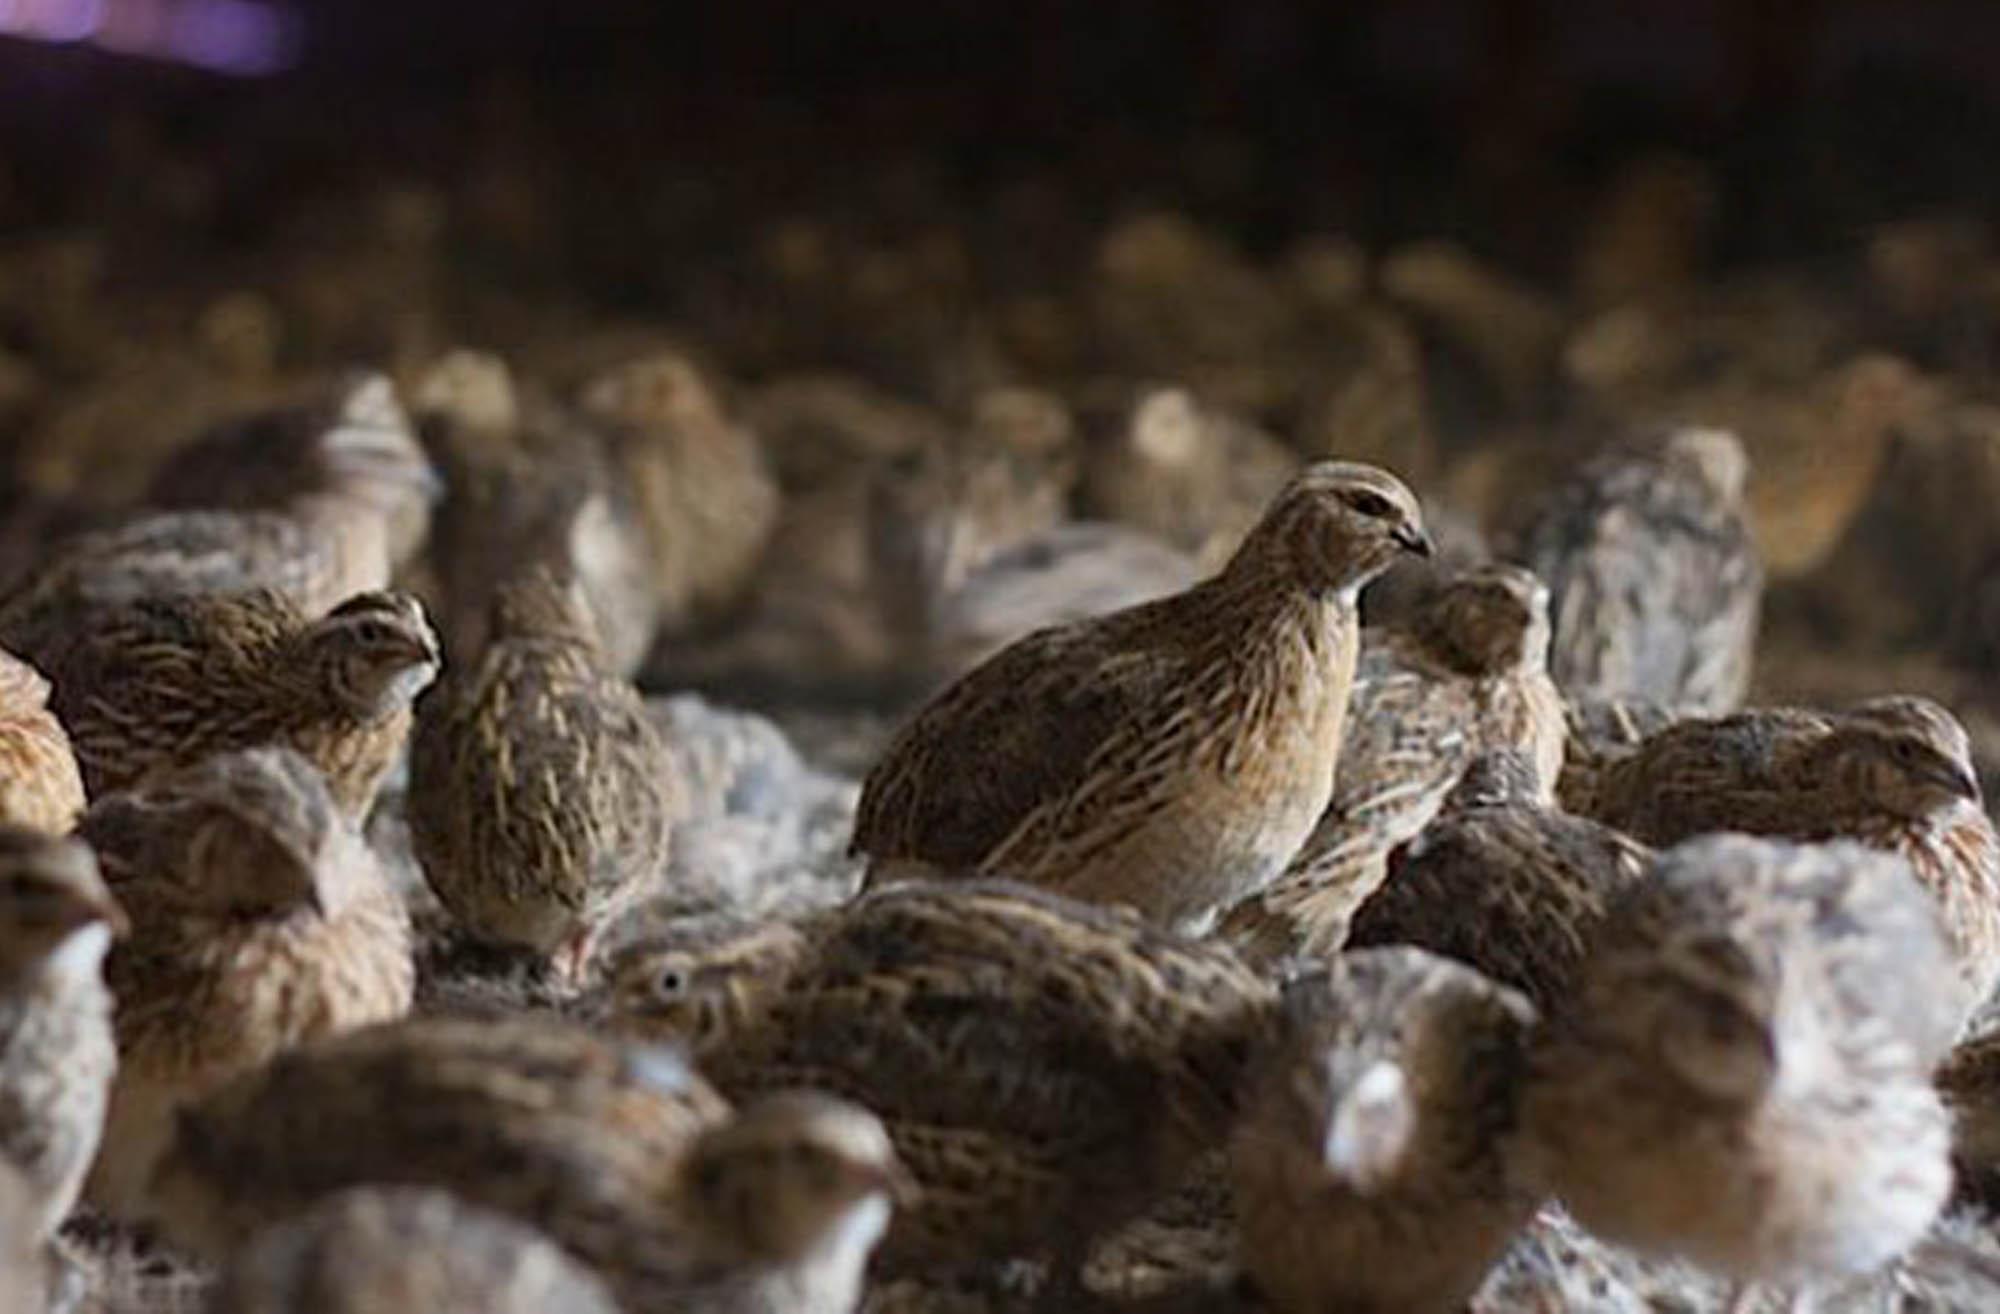 پرورش پرندگان به صورت یکجا